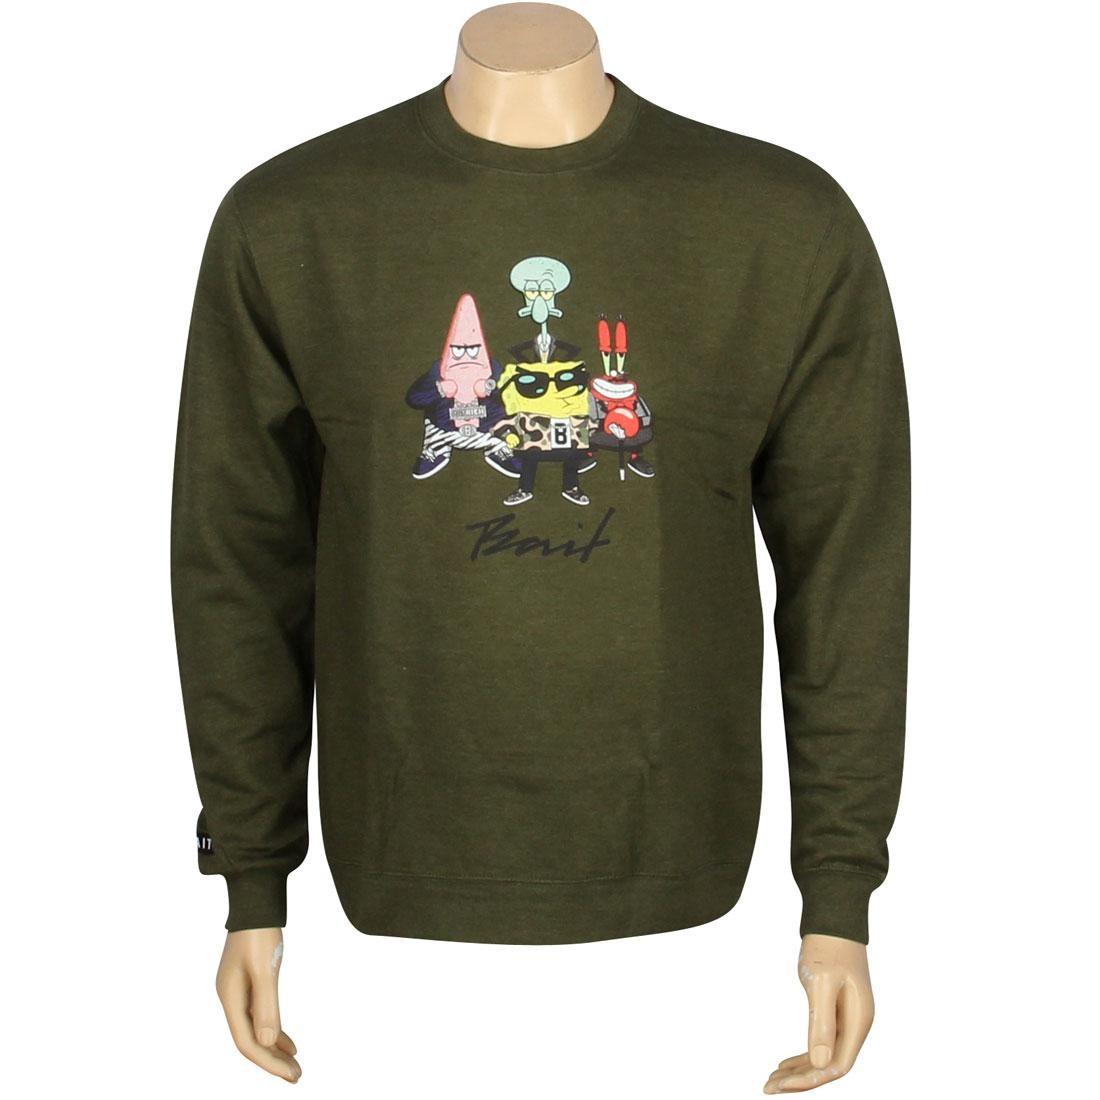 BAIT x SpongeBob Group Crewneck (olive)